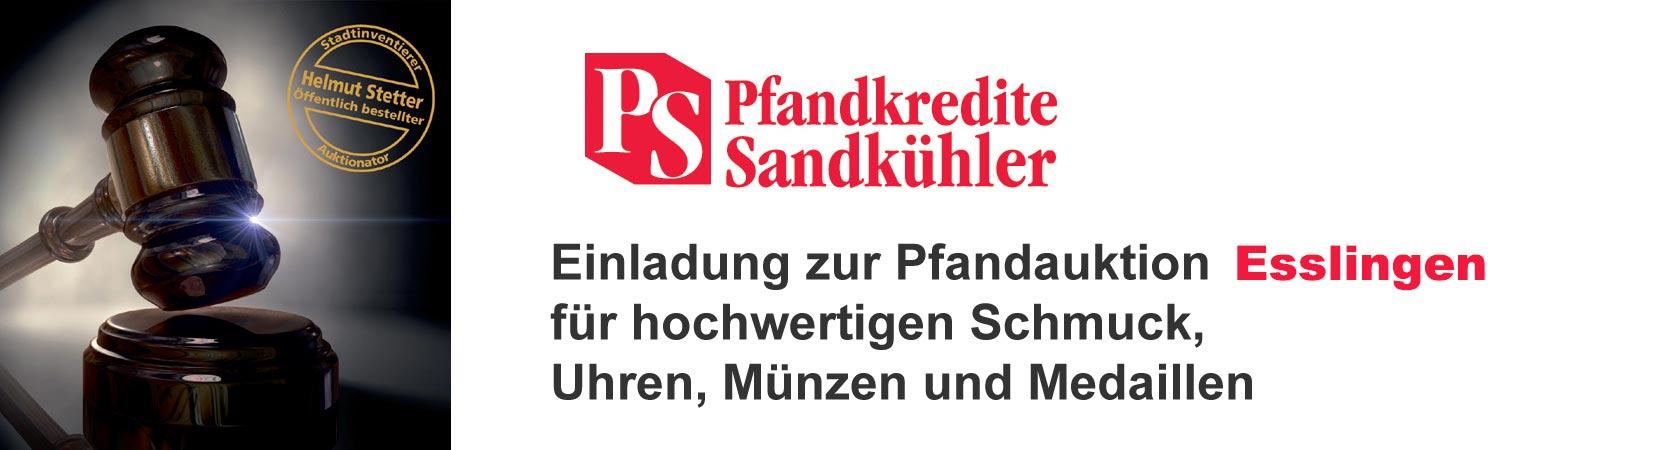 sandkuehler_pfandauktion